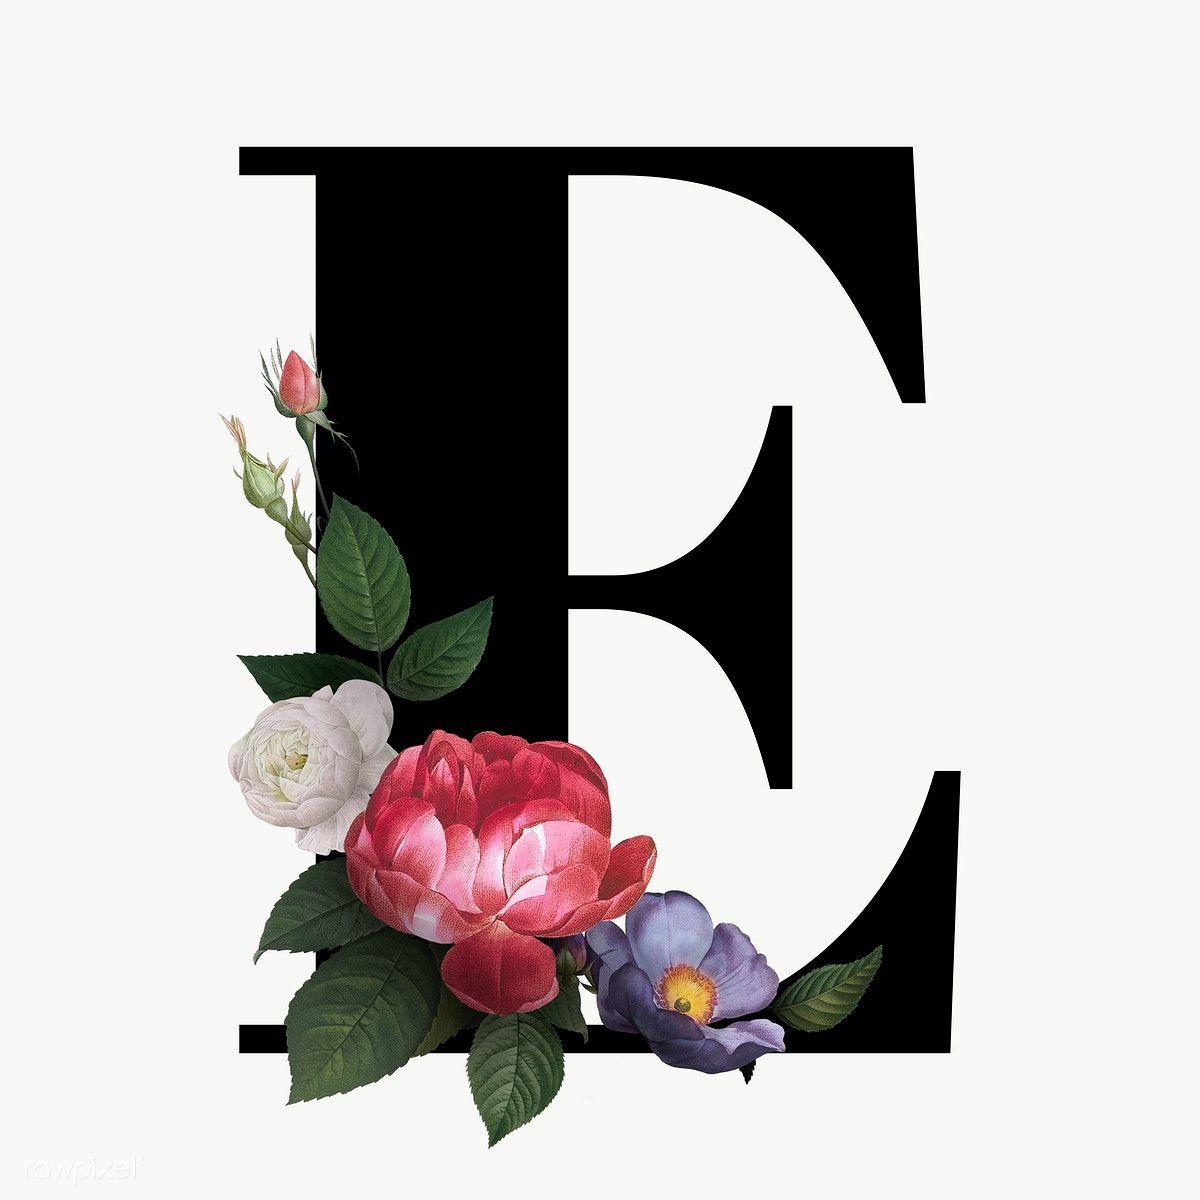 Classic And Elegant Floral Alphabet Font Letter E Transparent Png Free Image By Rawpixel Com Manotang Alphabet Illustration Lettering Fonts Fonts Alphabet